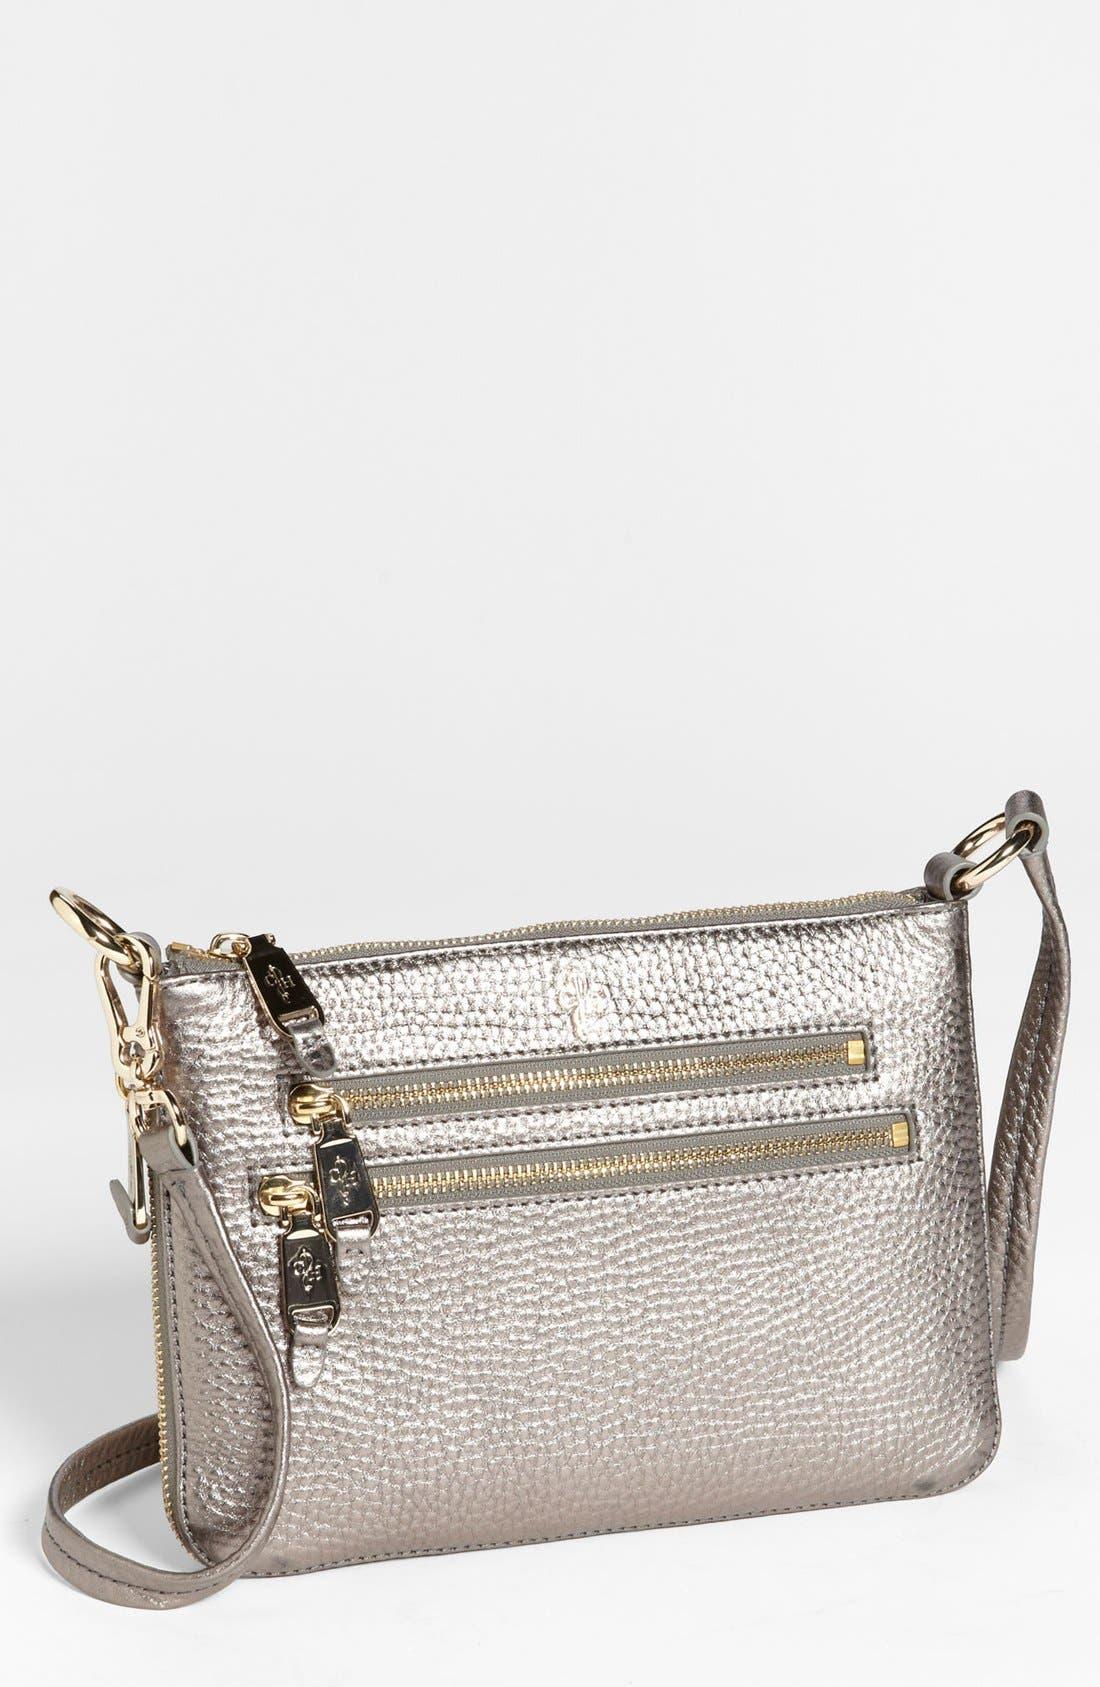 Main Image - Cole Haan 'Village Sheila' Crossbody Bag, Small